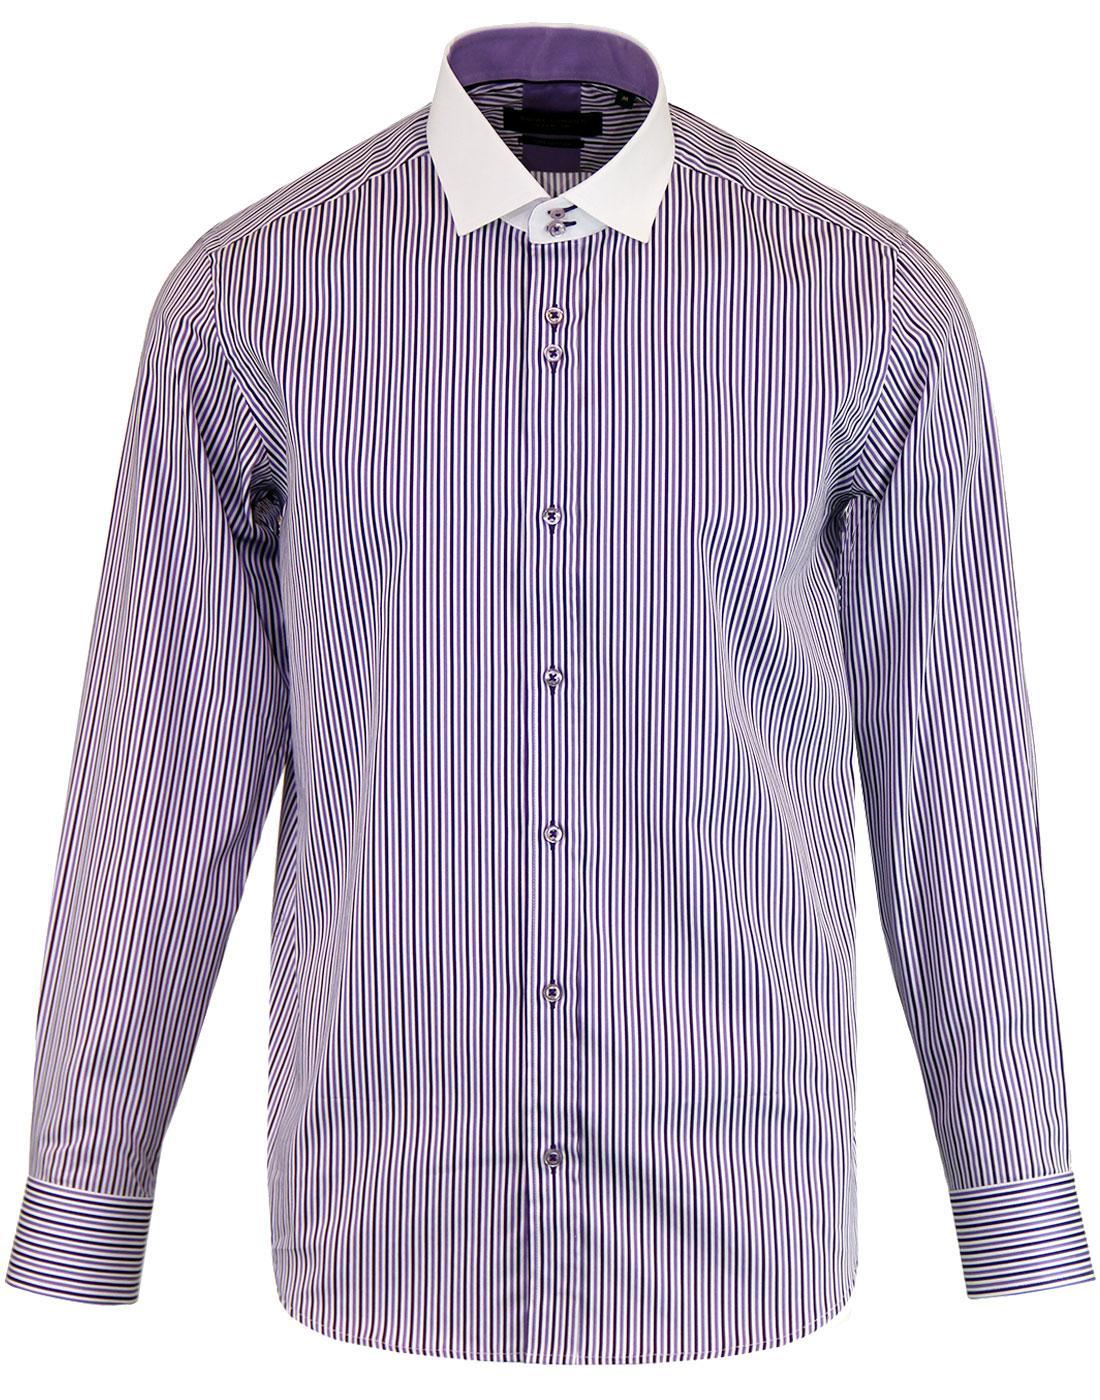 GUIDE LONDON Retro Contrast Collar Stripe Shirt L